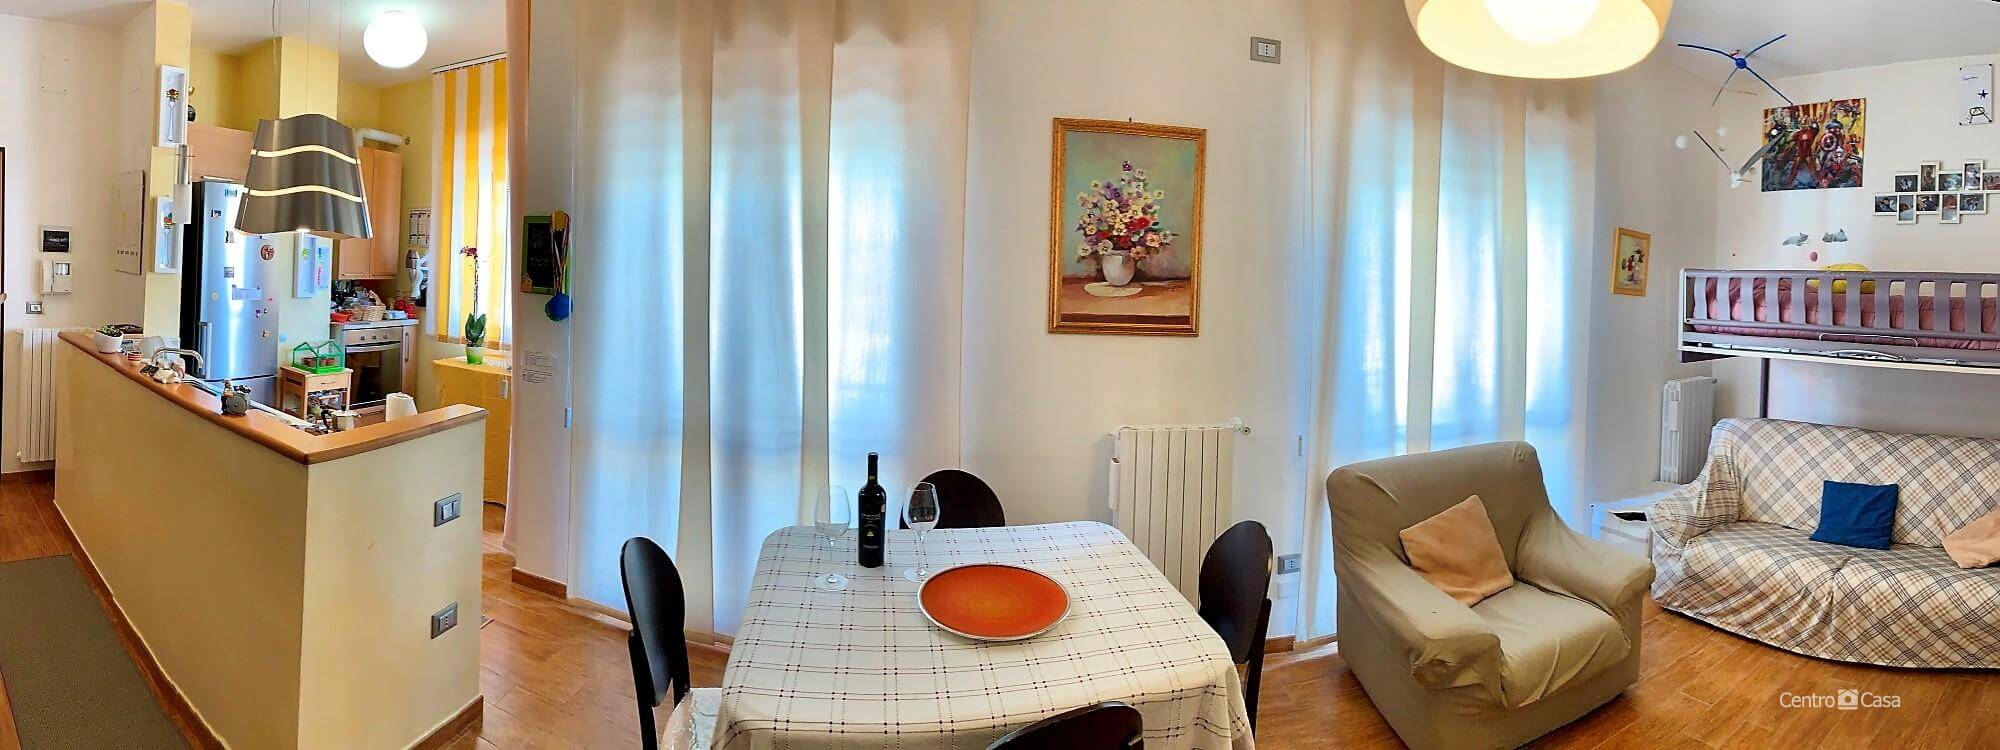 Appartamento via Giovanni XXIII